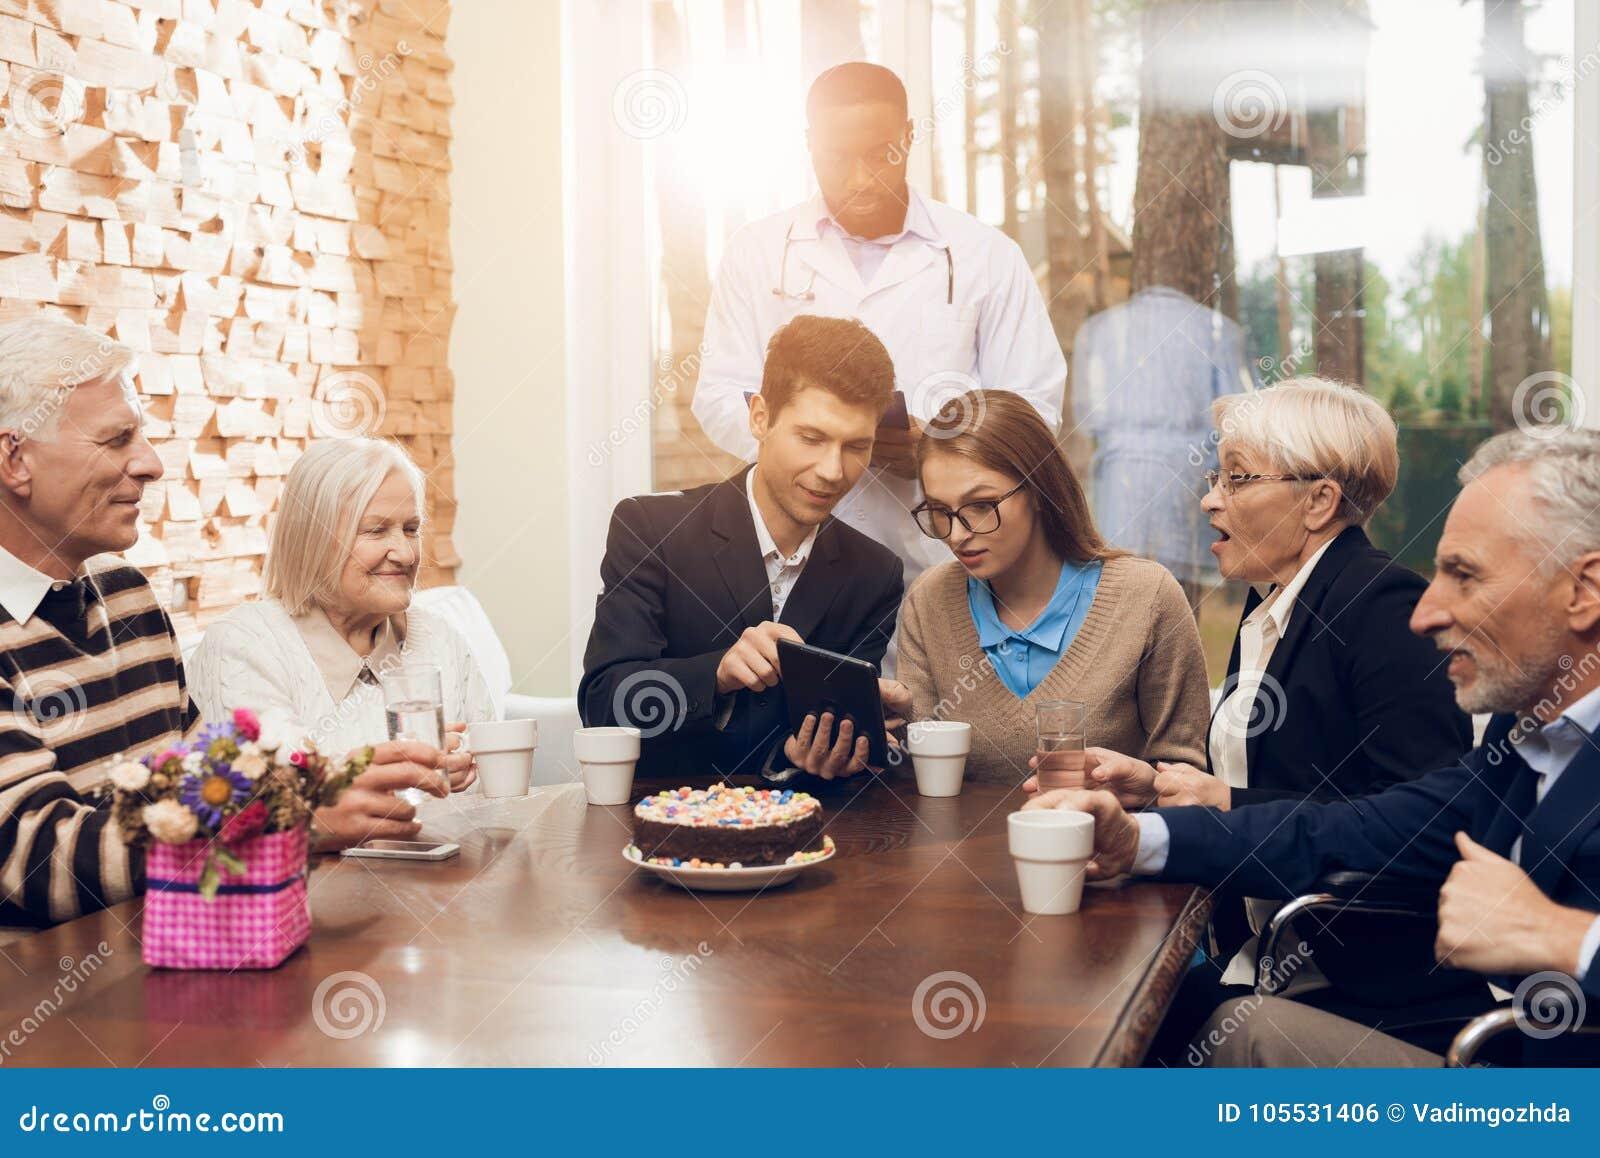 Старые дома для престарелых дом престарелых пучеж телефон